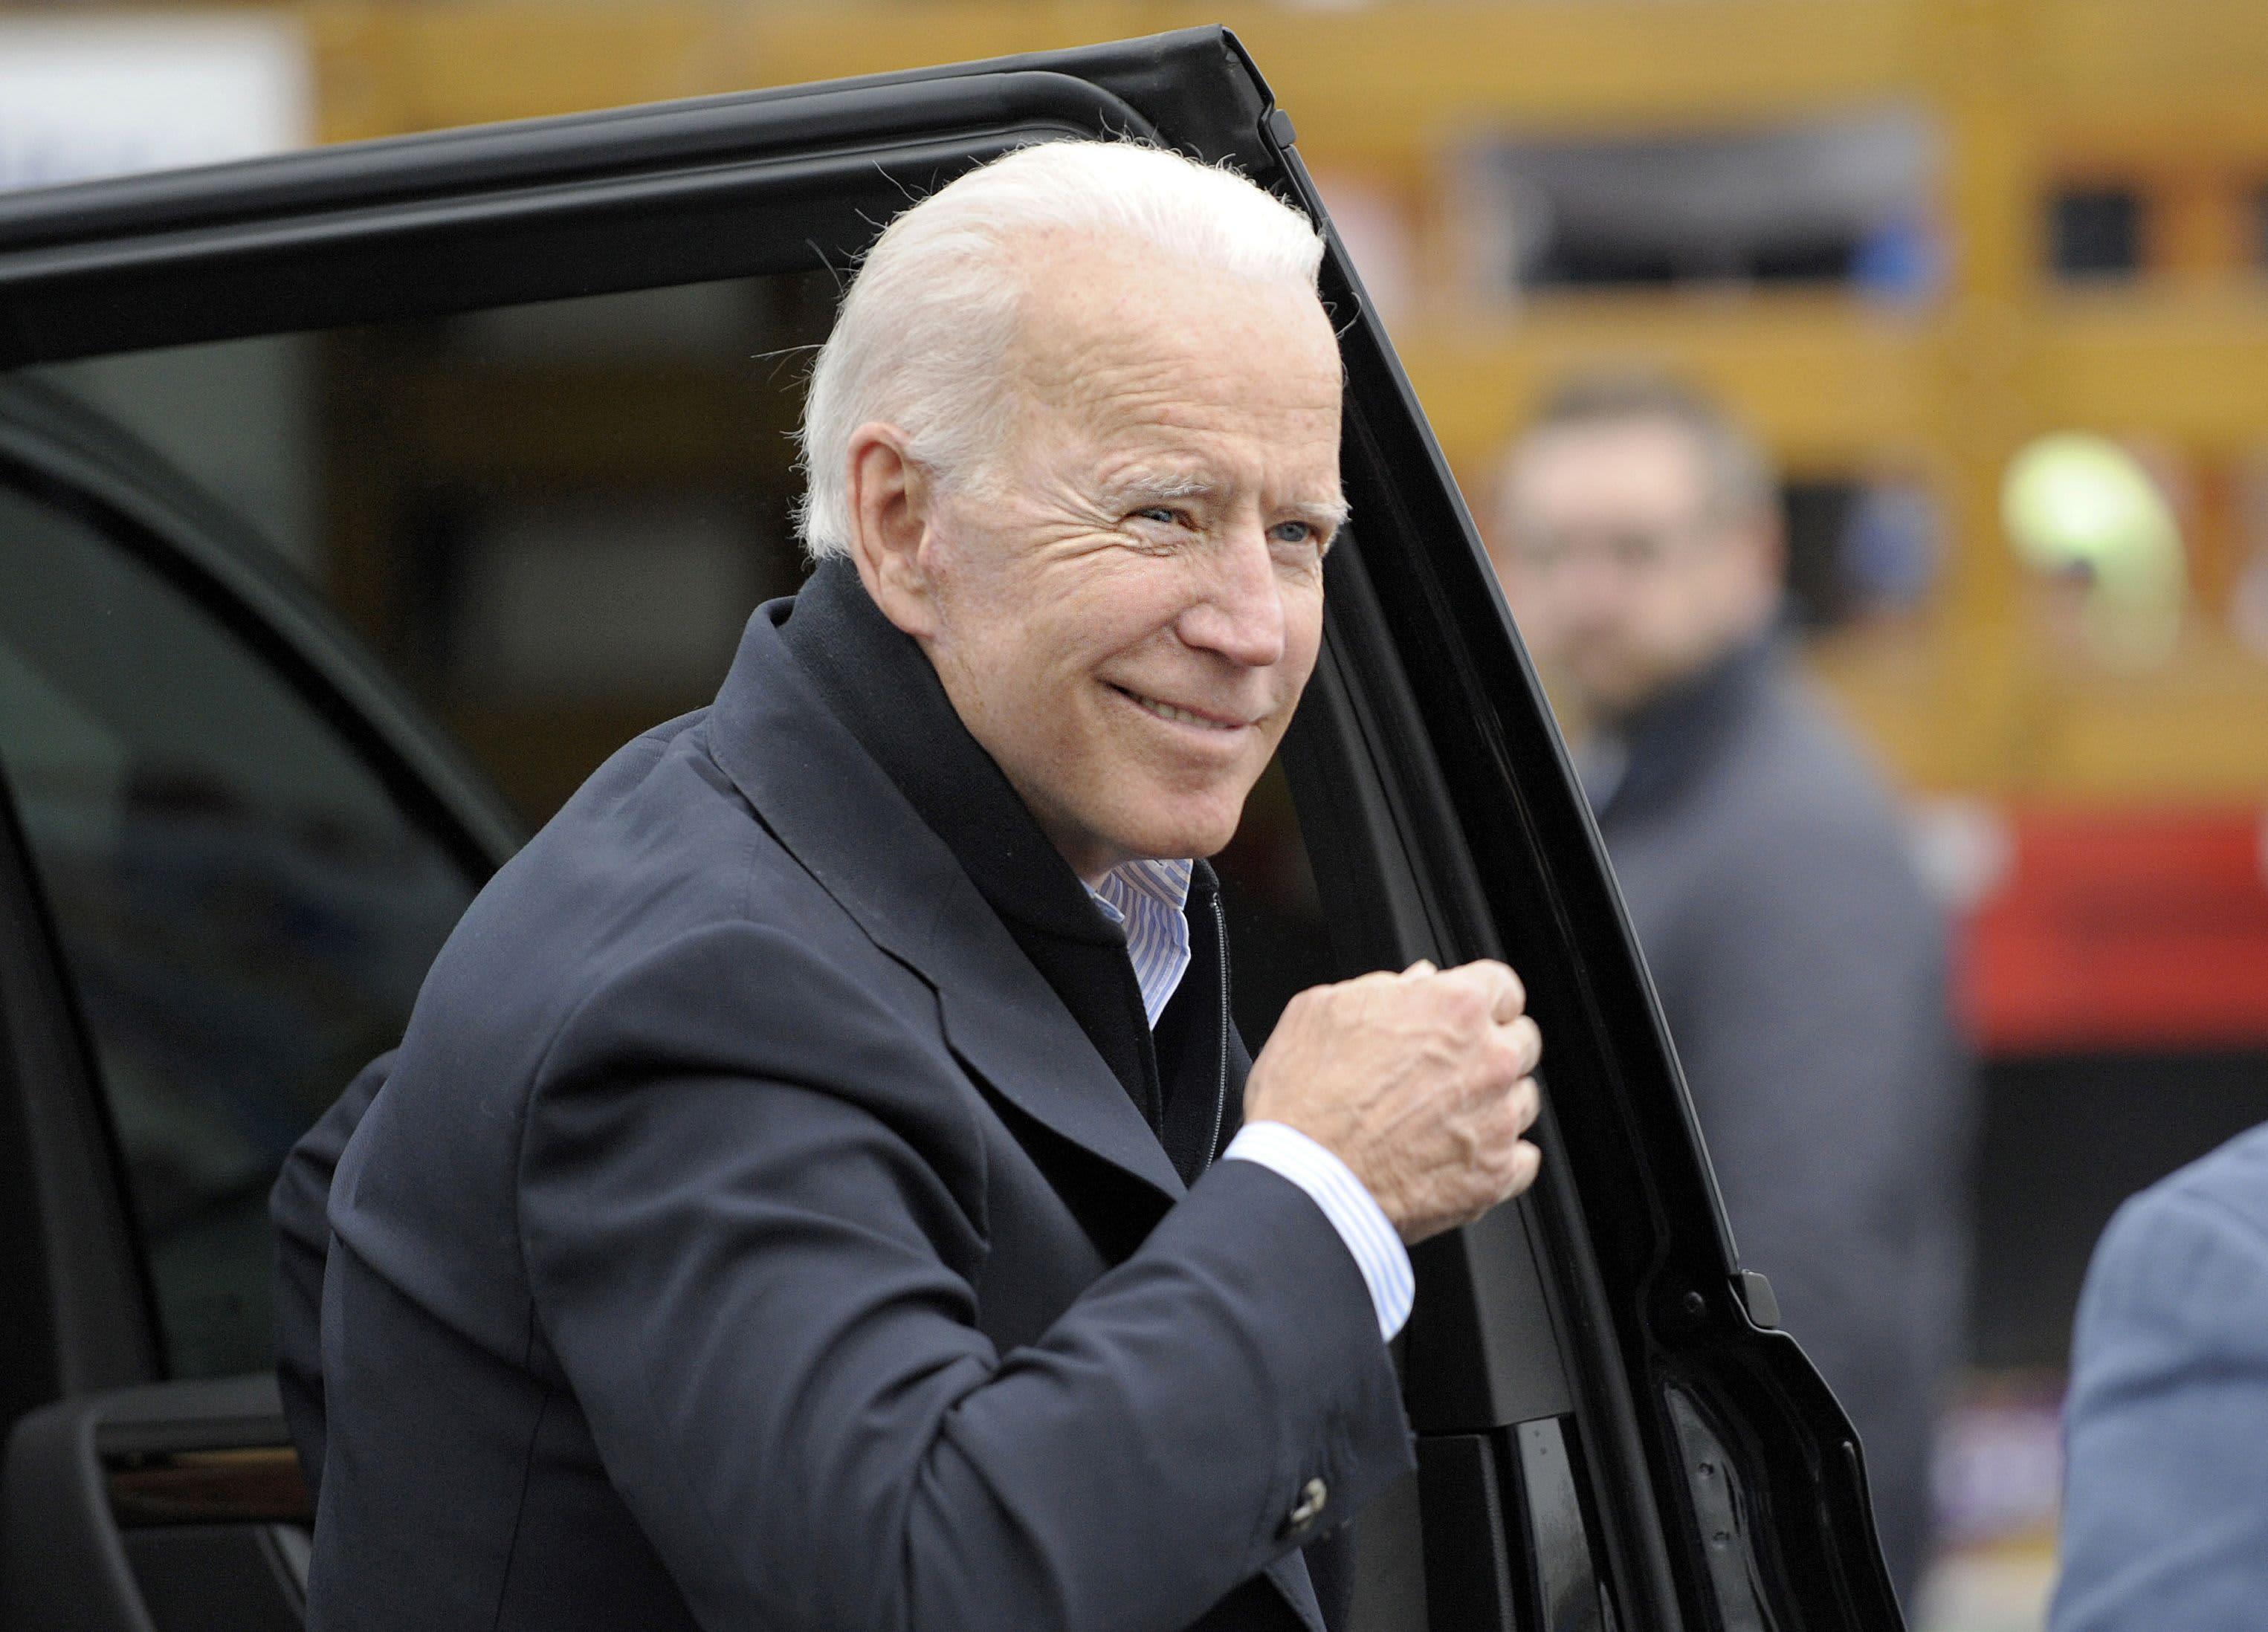 Biden reports $6.3 million 1-day haul, biggest in 2020 field